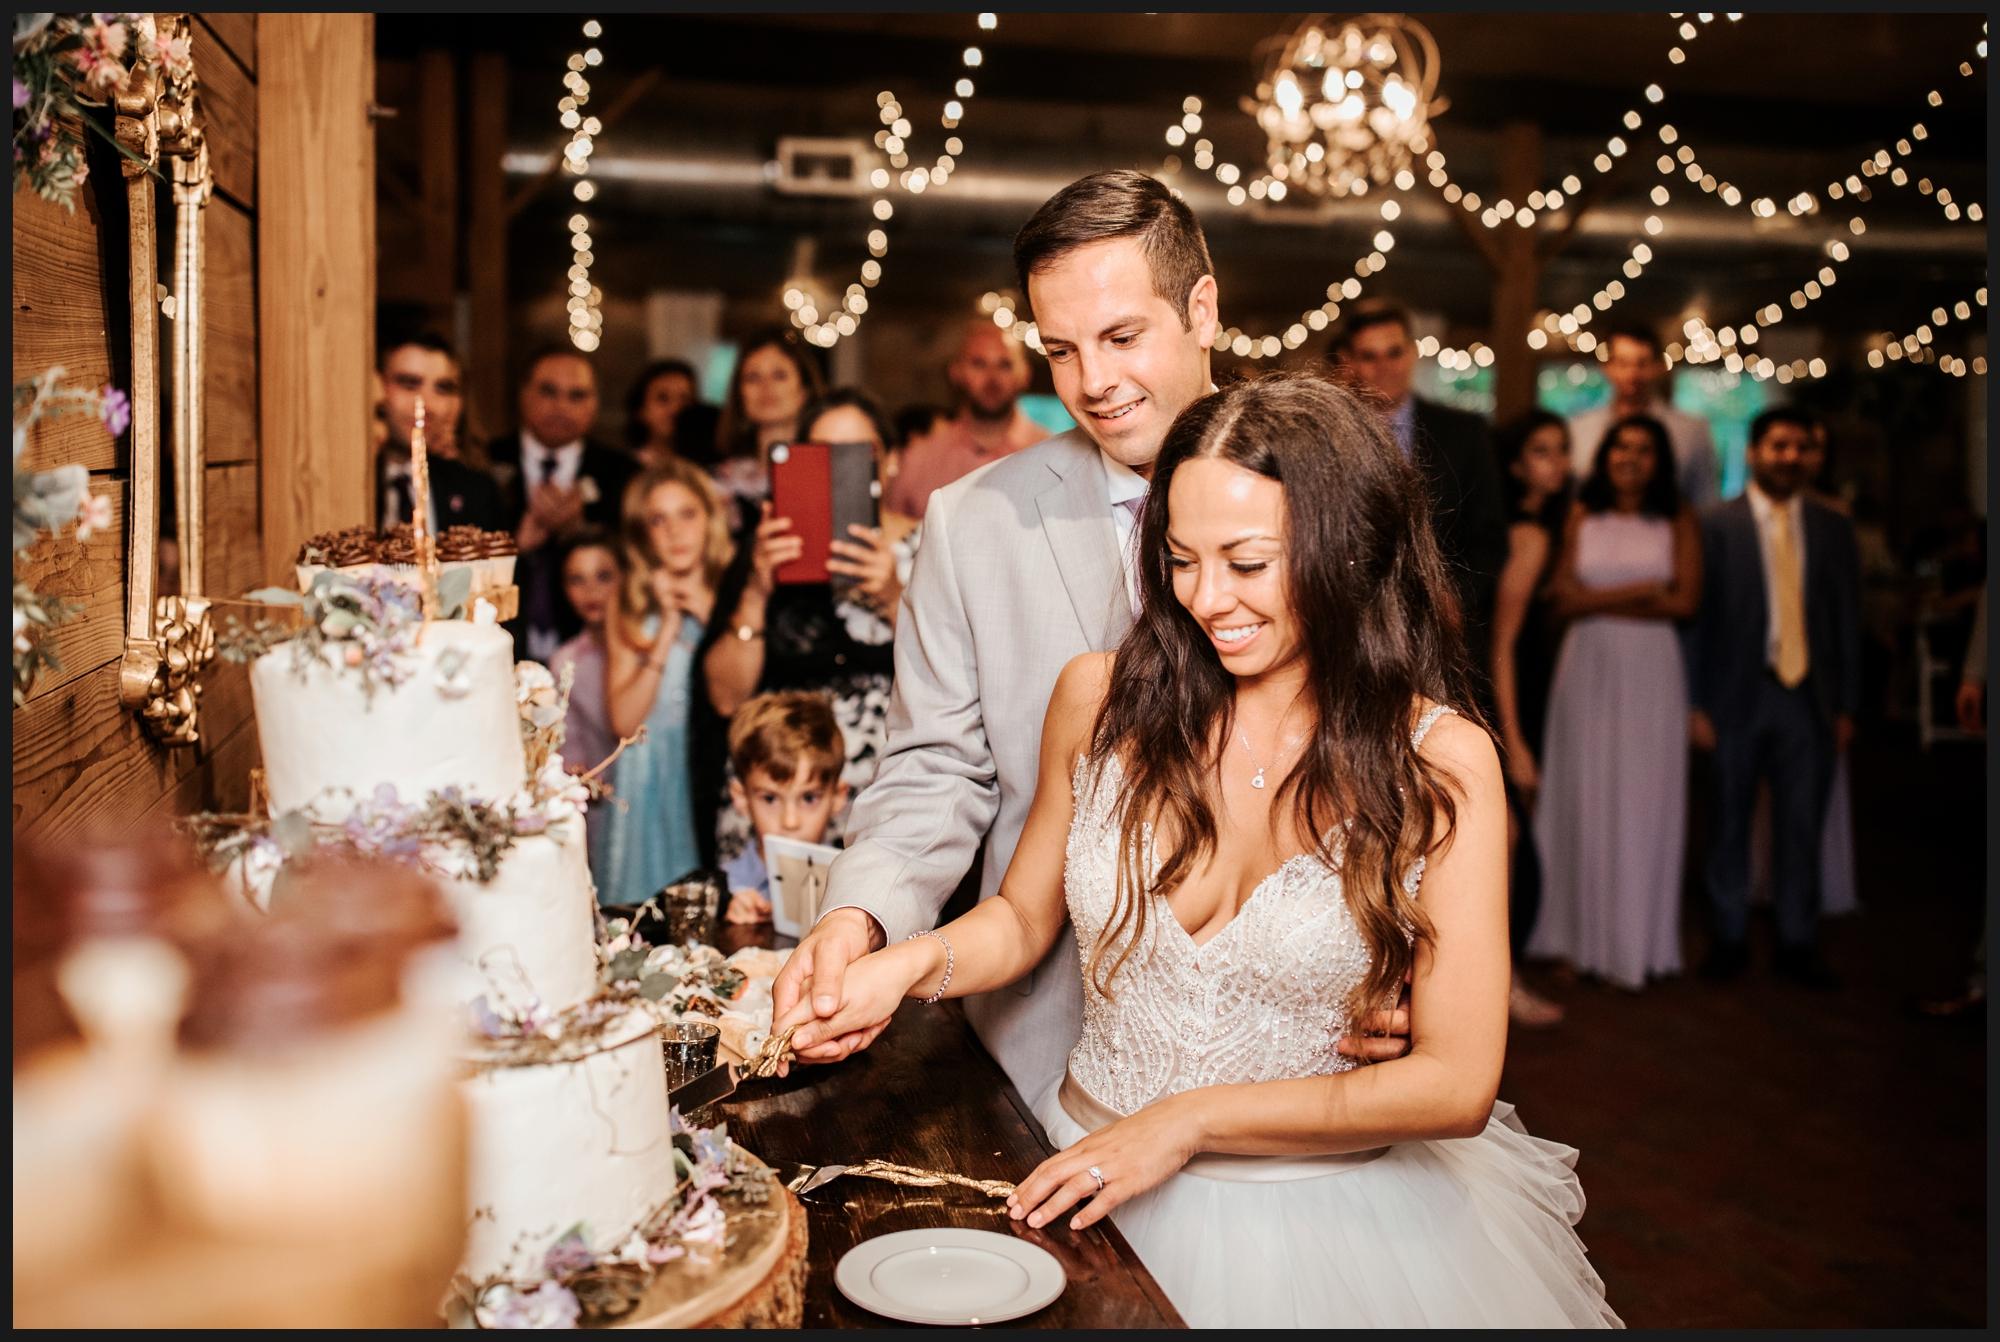 Orlando-Wedding-Photographer-destination-wedding-photographer-florida-wedding-photographer-bohemian-wedding-photographer_1645.jpg